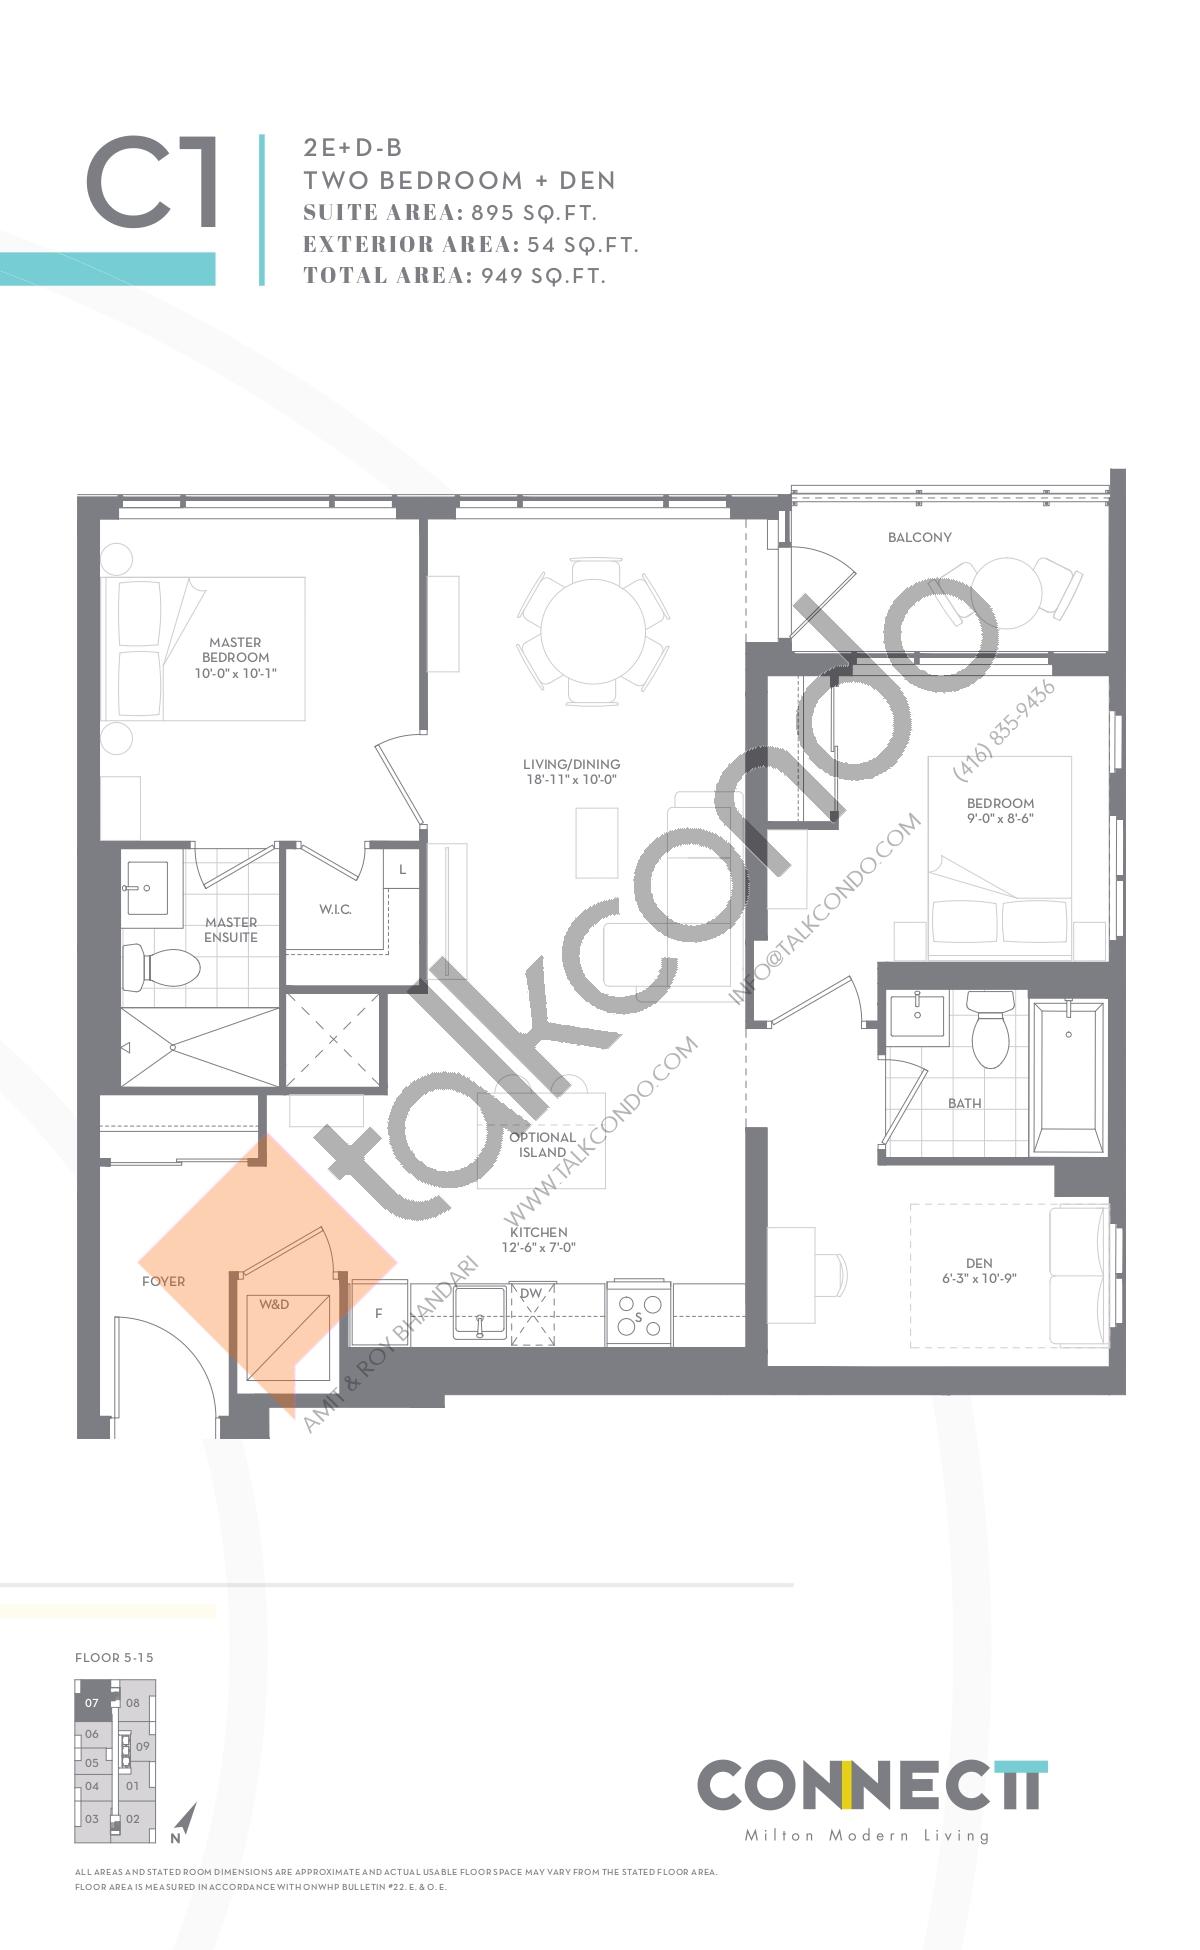 2E+D-B Floor Plan at Connectt Urban Community Condos - 895 sq.ft